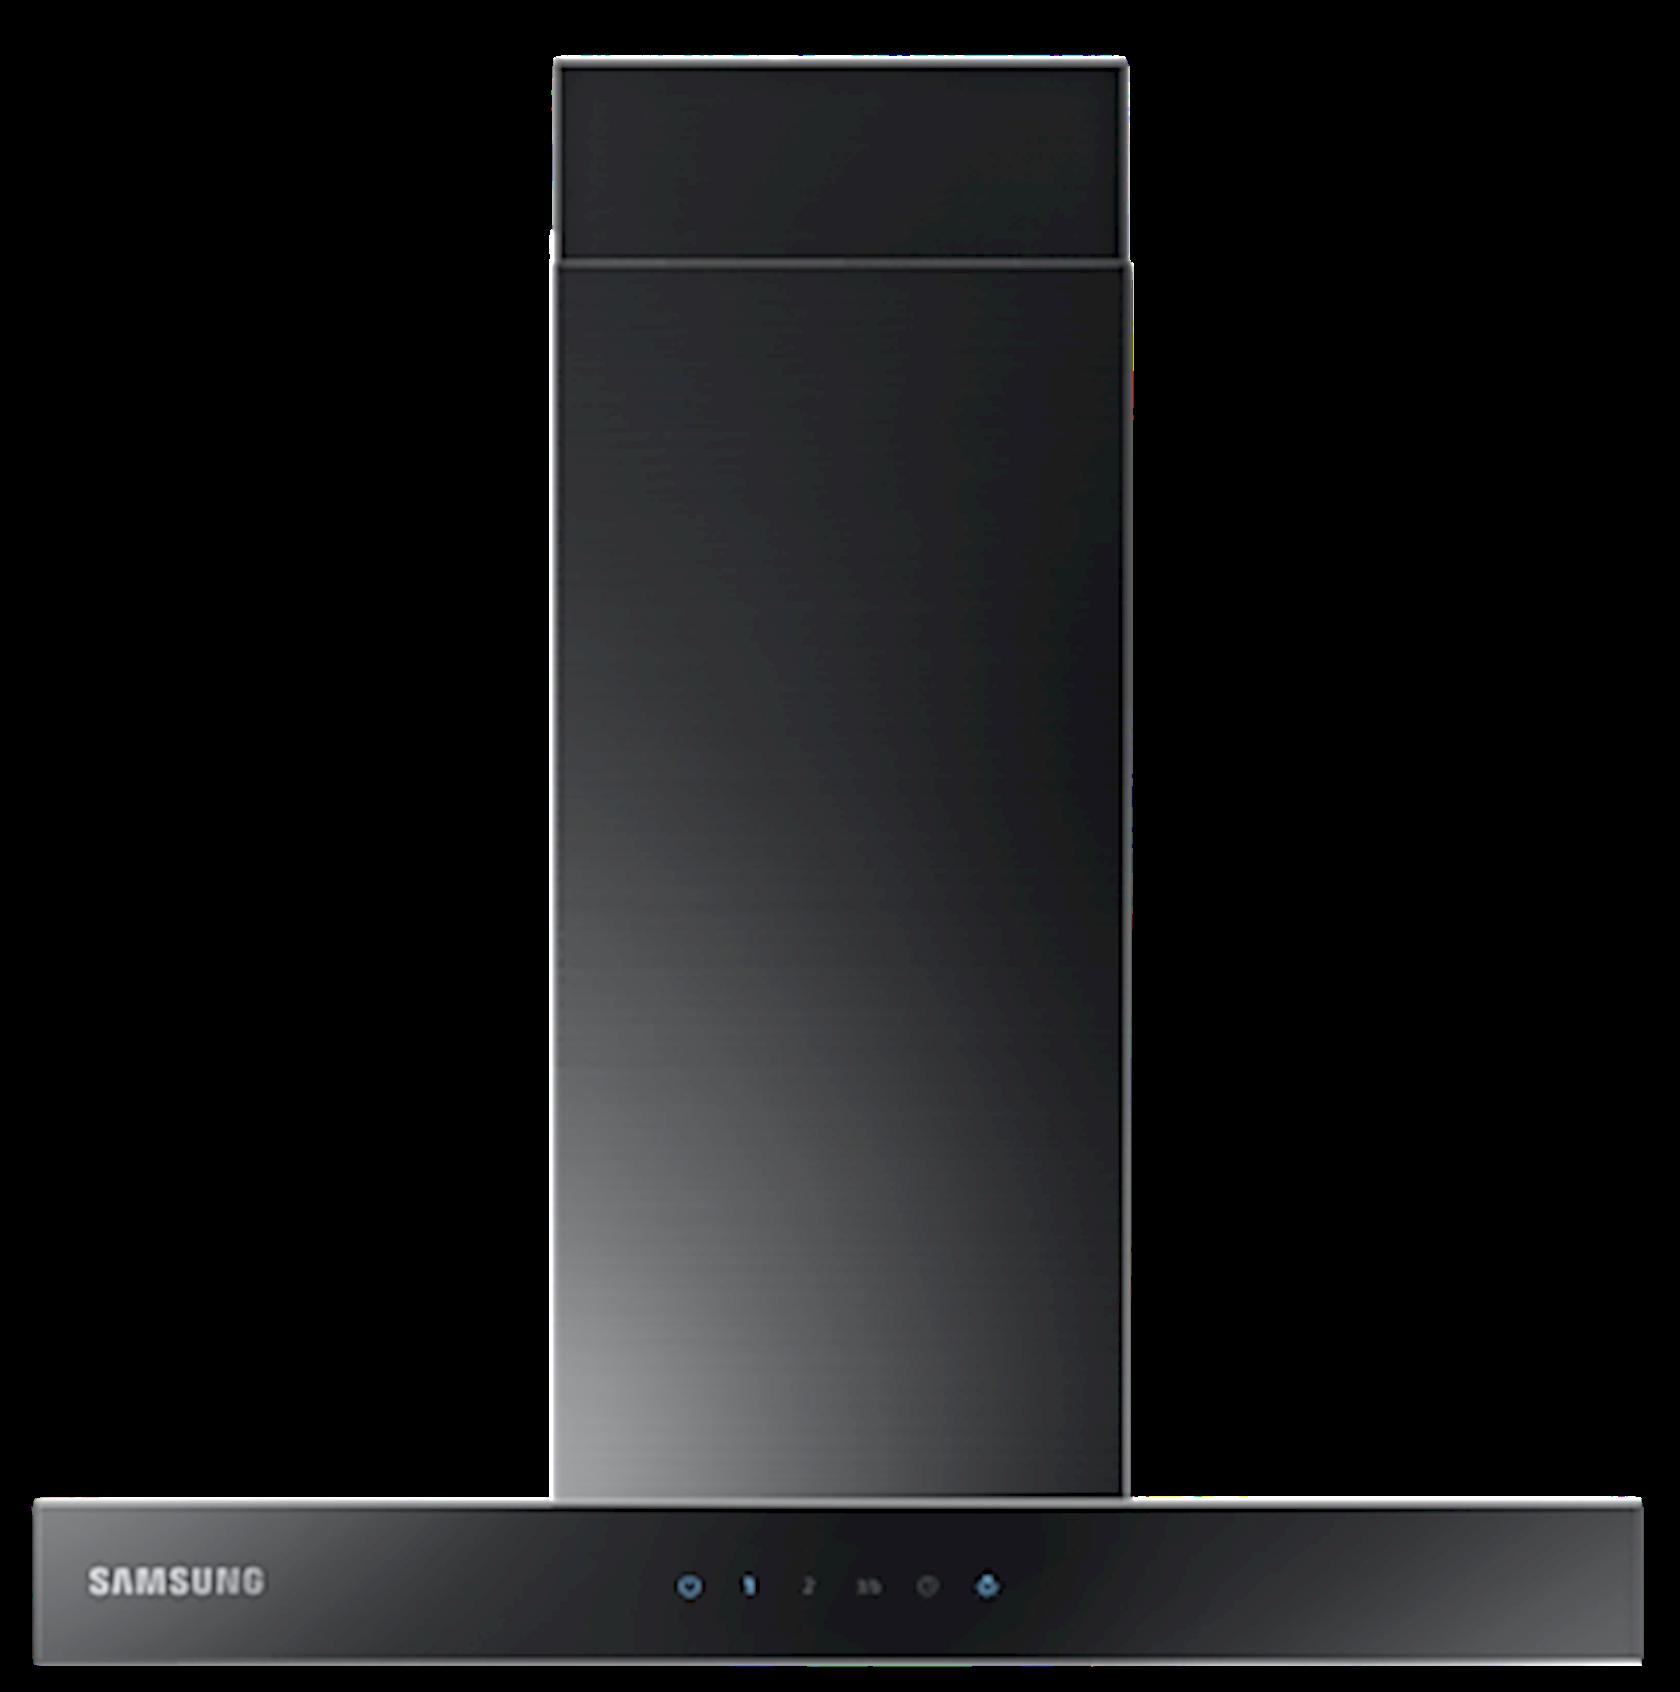 Aspirator Samsung NK24M5070BG